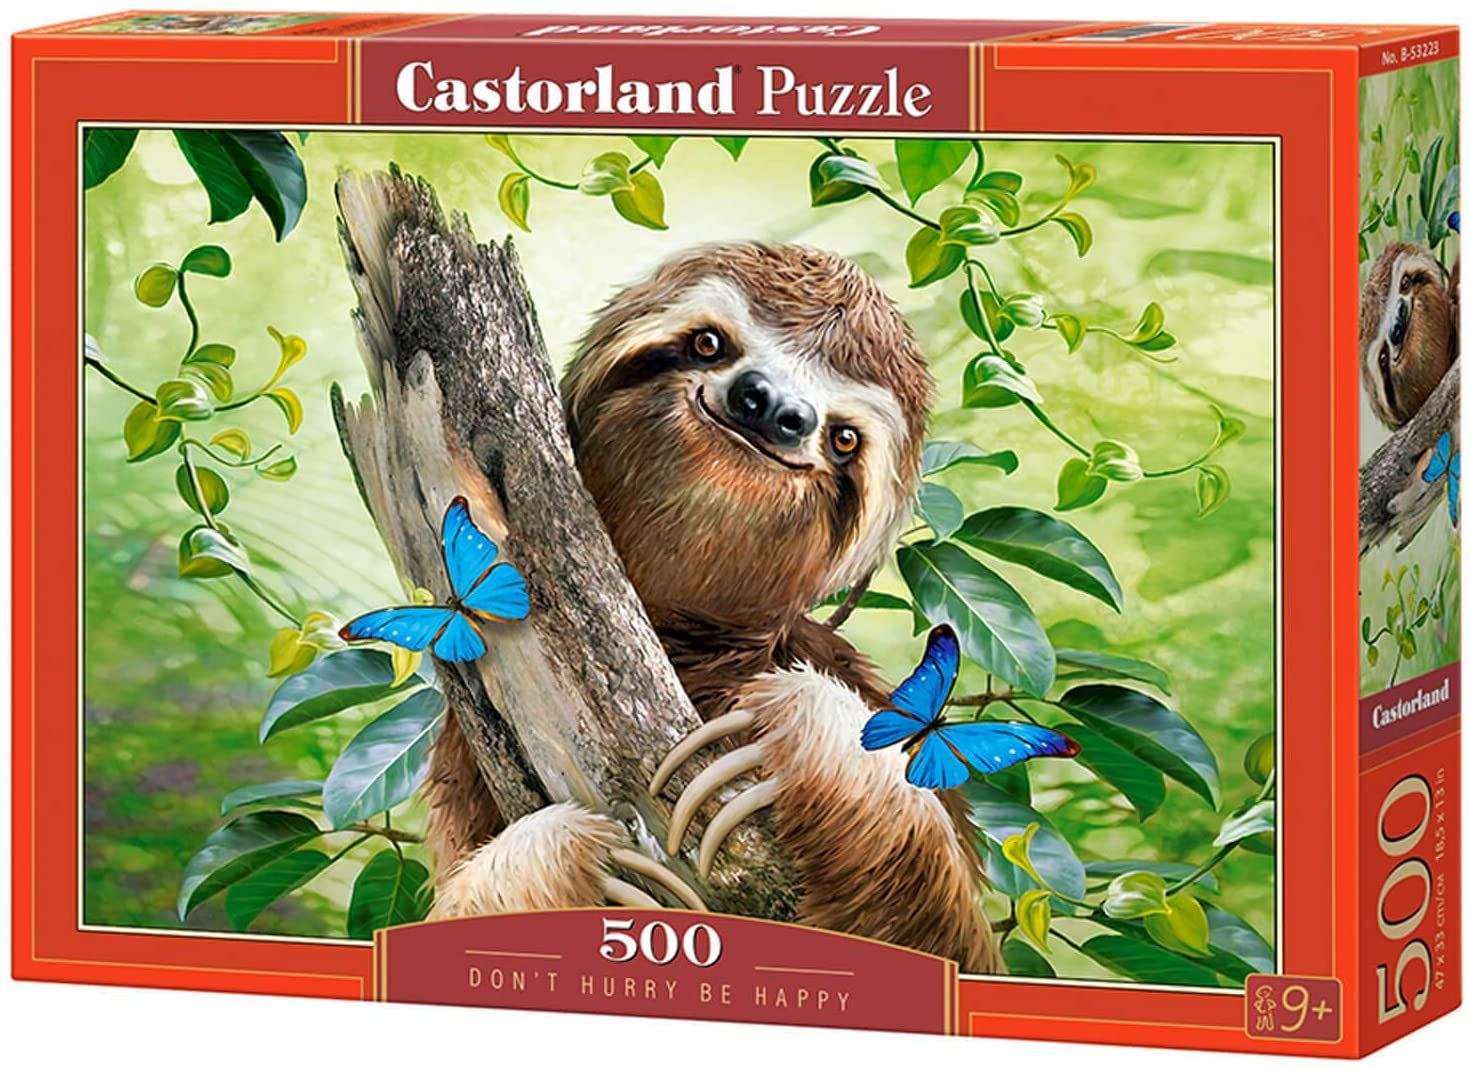 Castorland Don't Hurry Be Happy 500 Piece Jigsaw